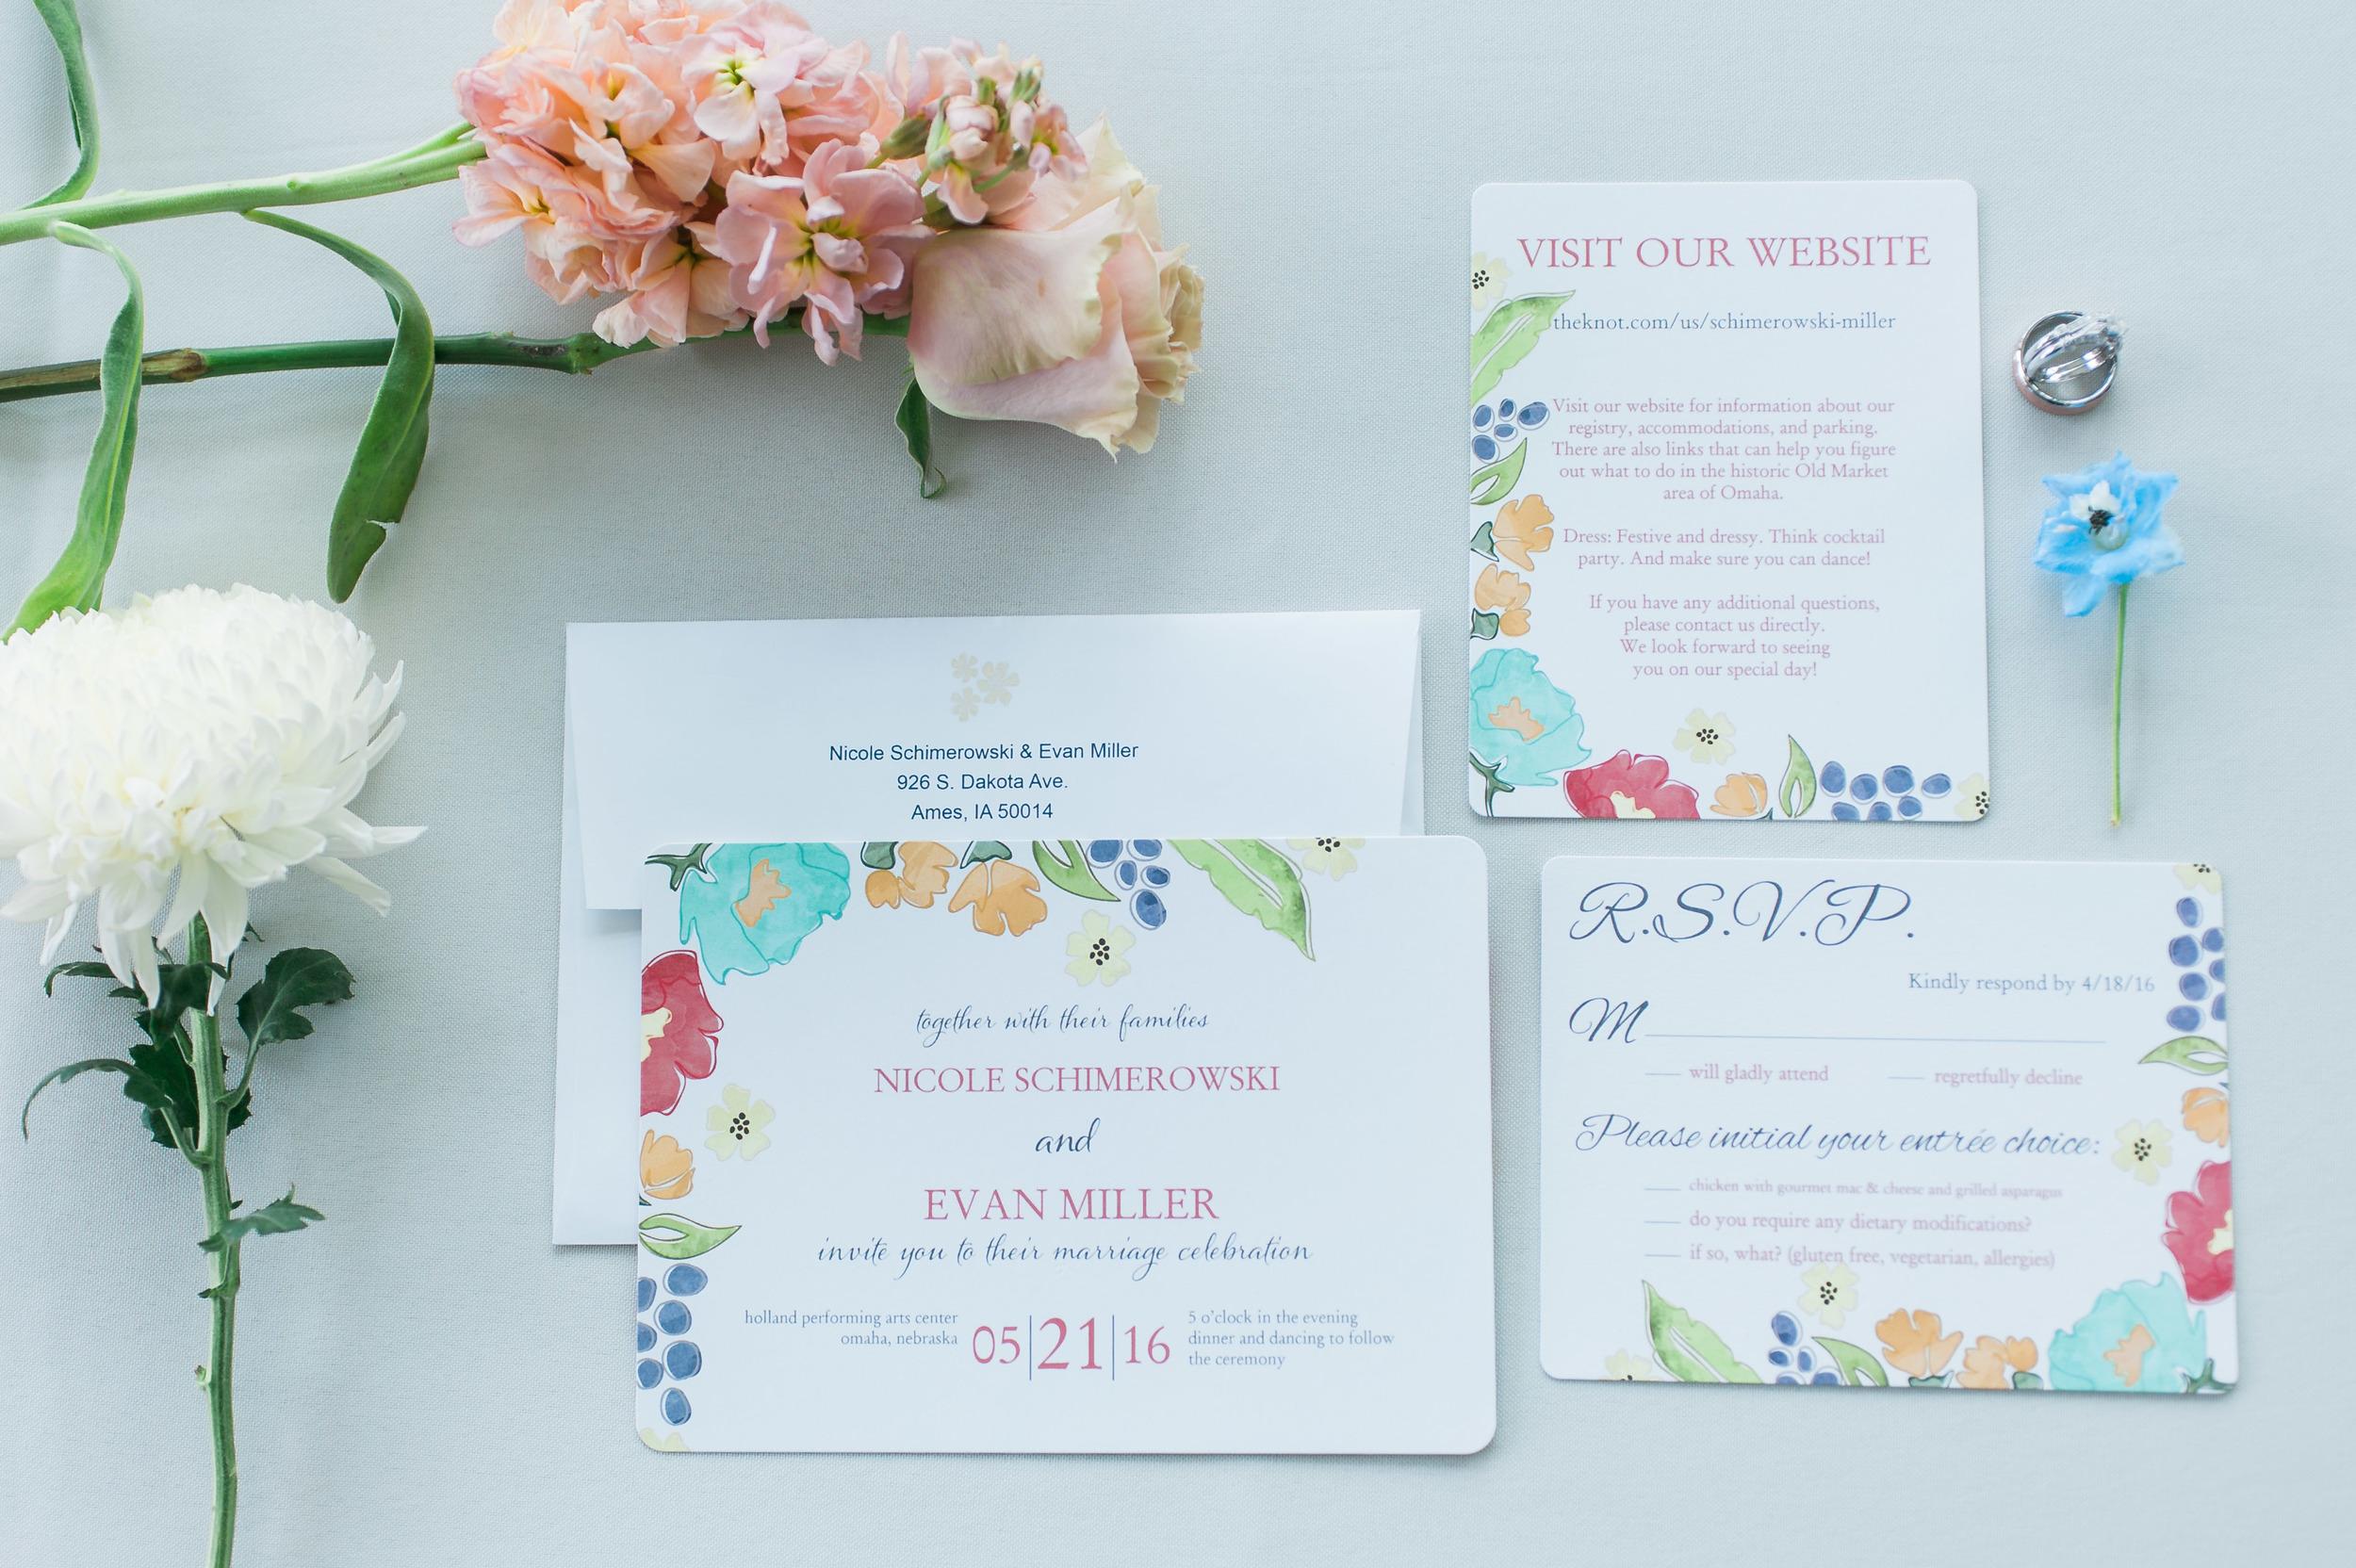 omaha-holland-arts-center-wedding-14.jpg